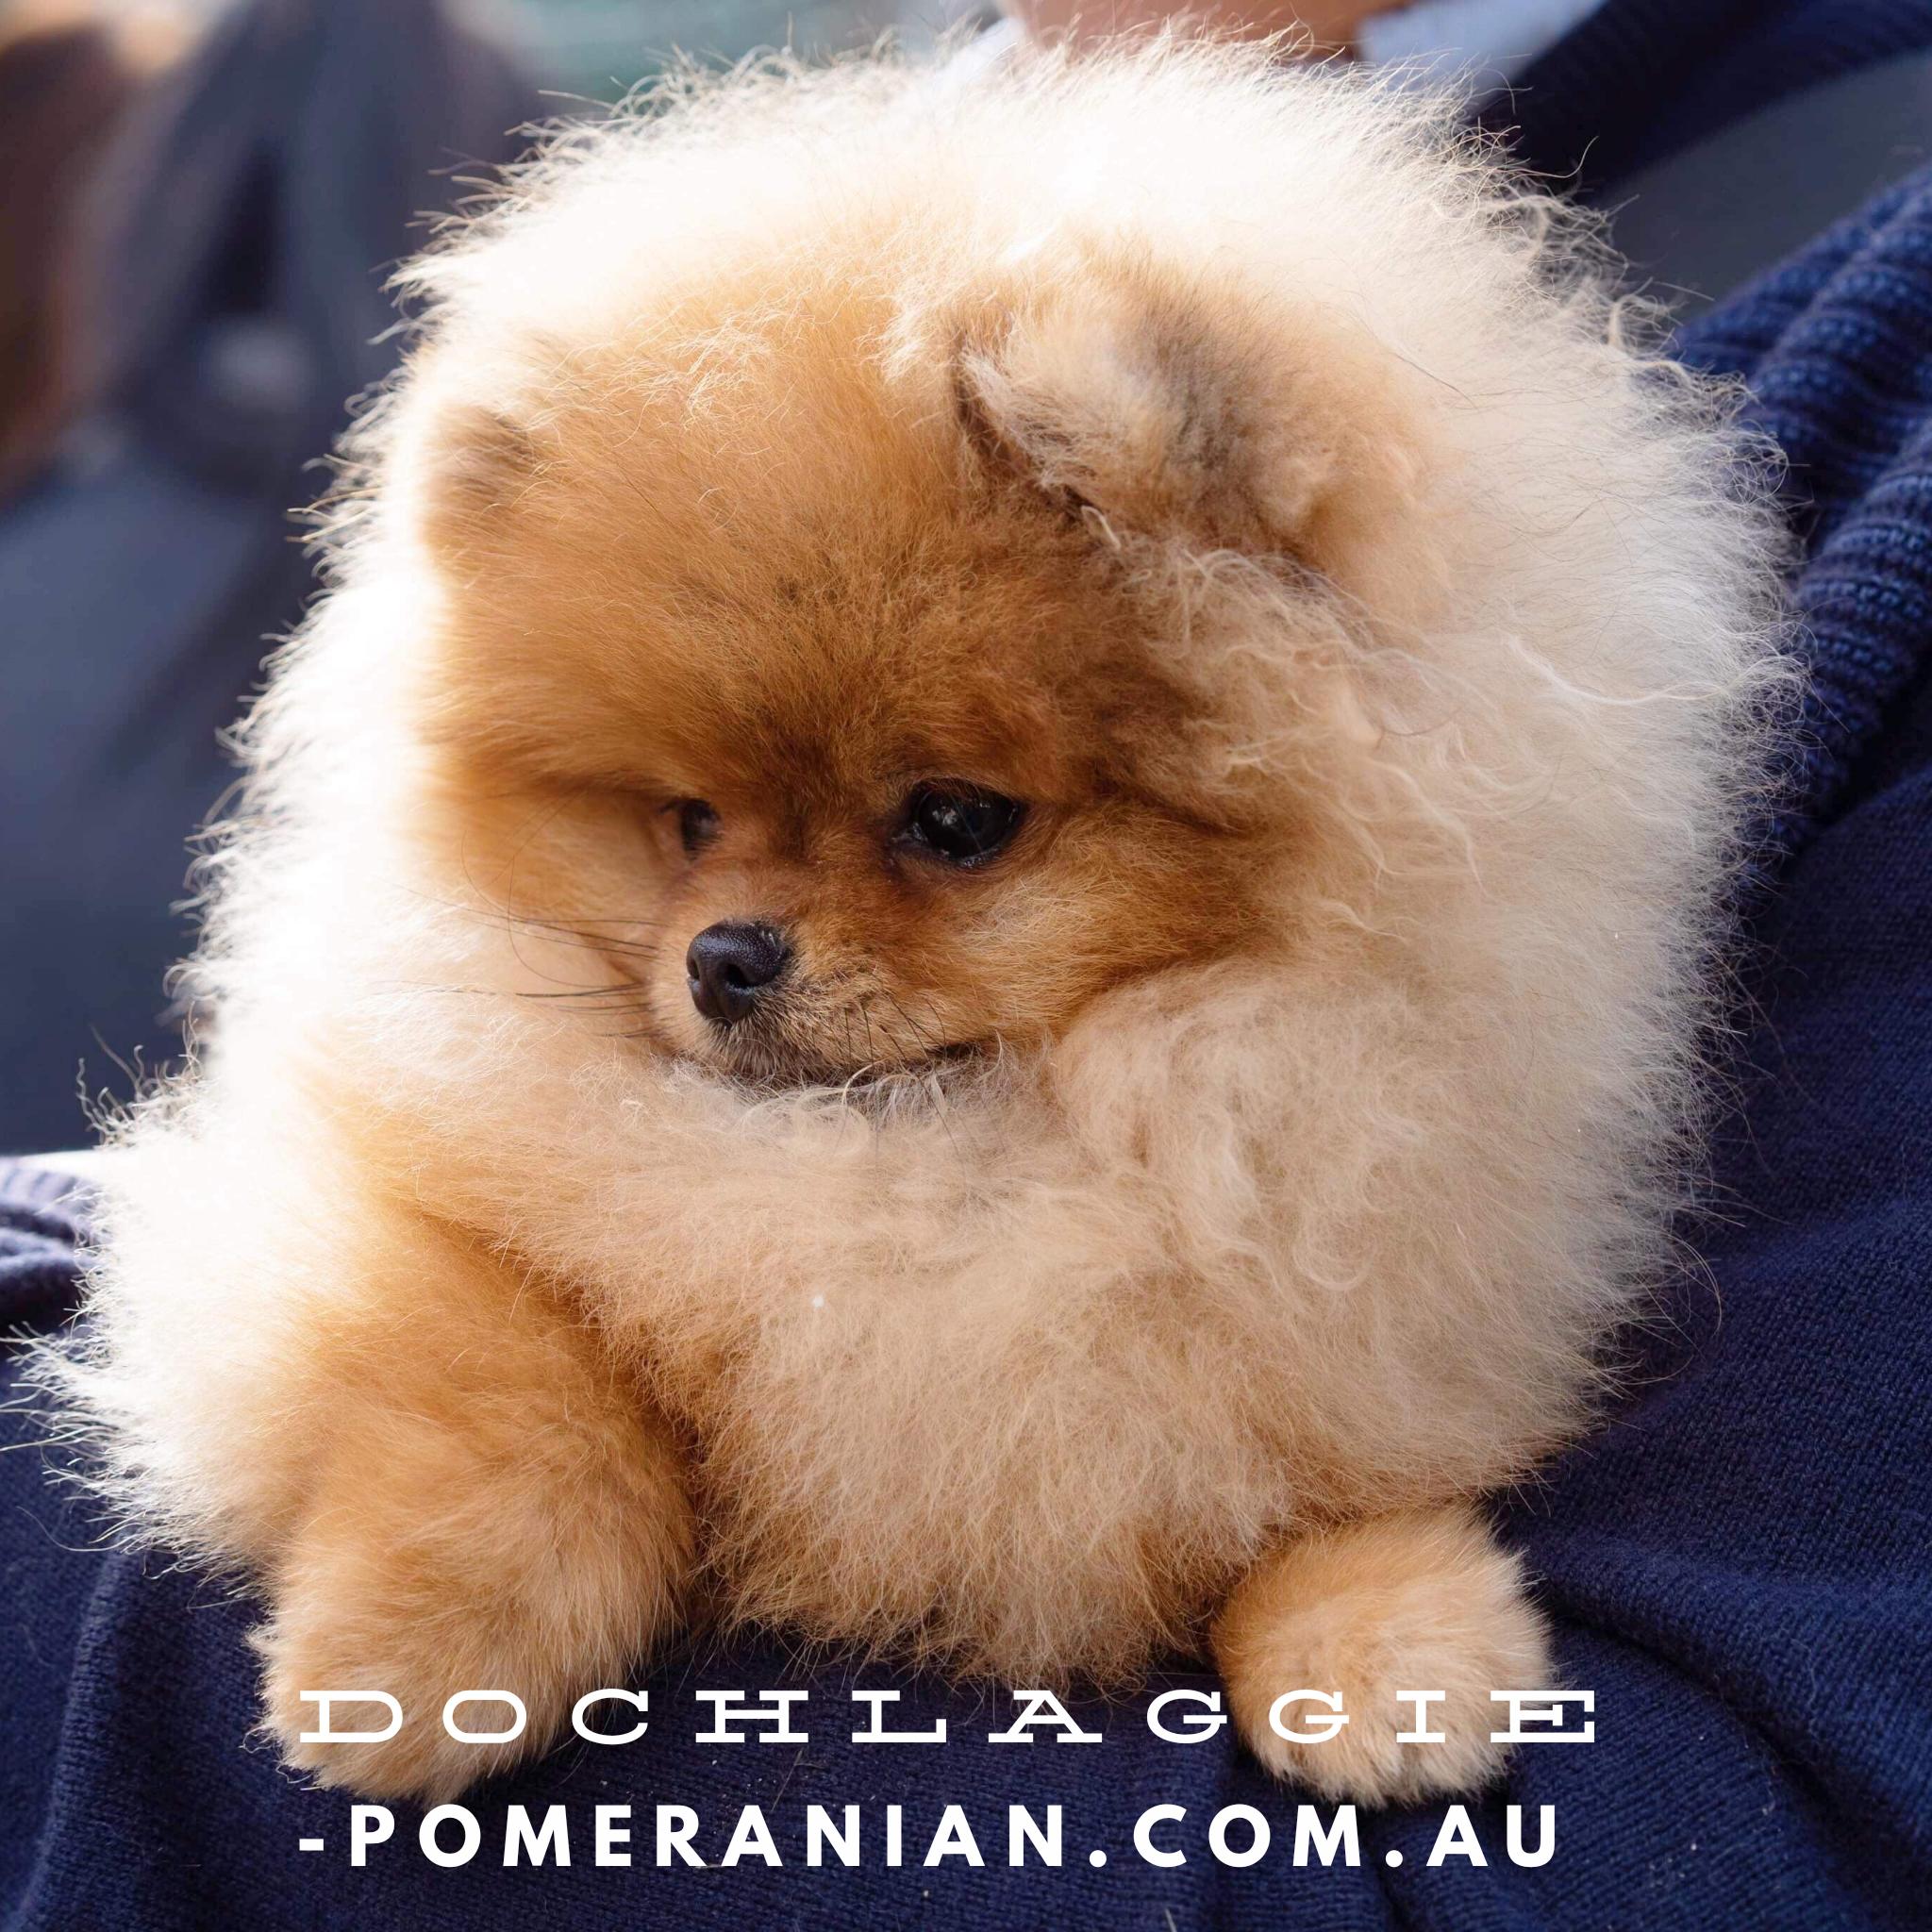 Dochlaggie Pomeranian Puppies Melbourne Dochlaggie Dochlaggiepomeranians Pomeranians Pomeranian Pomeraniandog Pomeranian Dog Cute Dogs Pomeranian Puppy